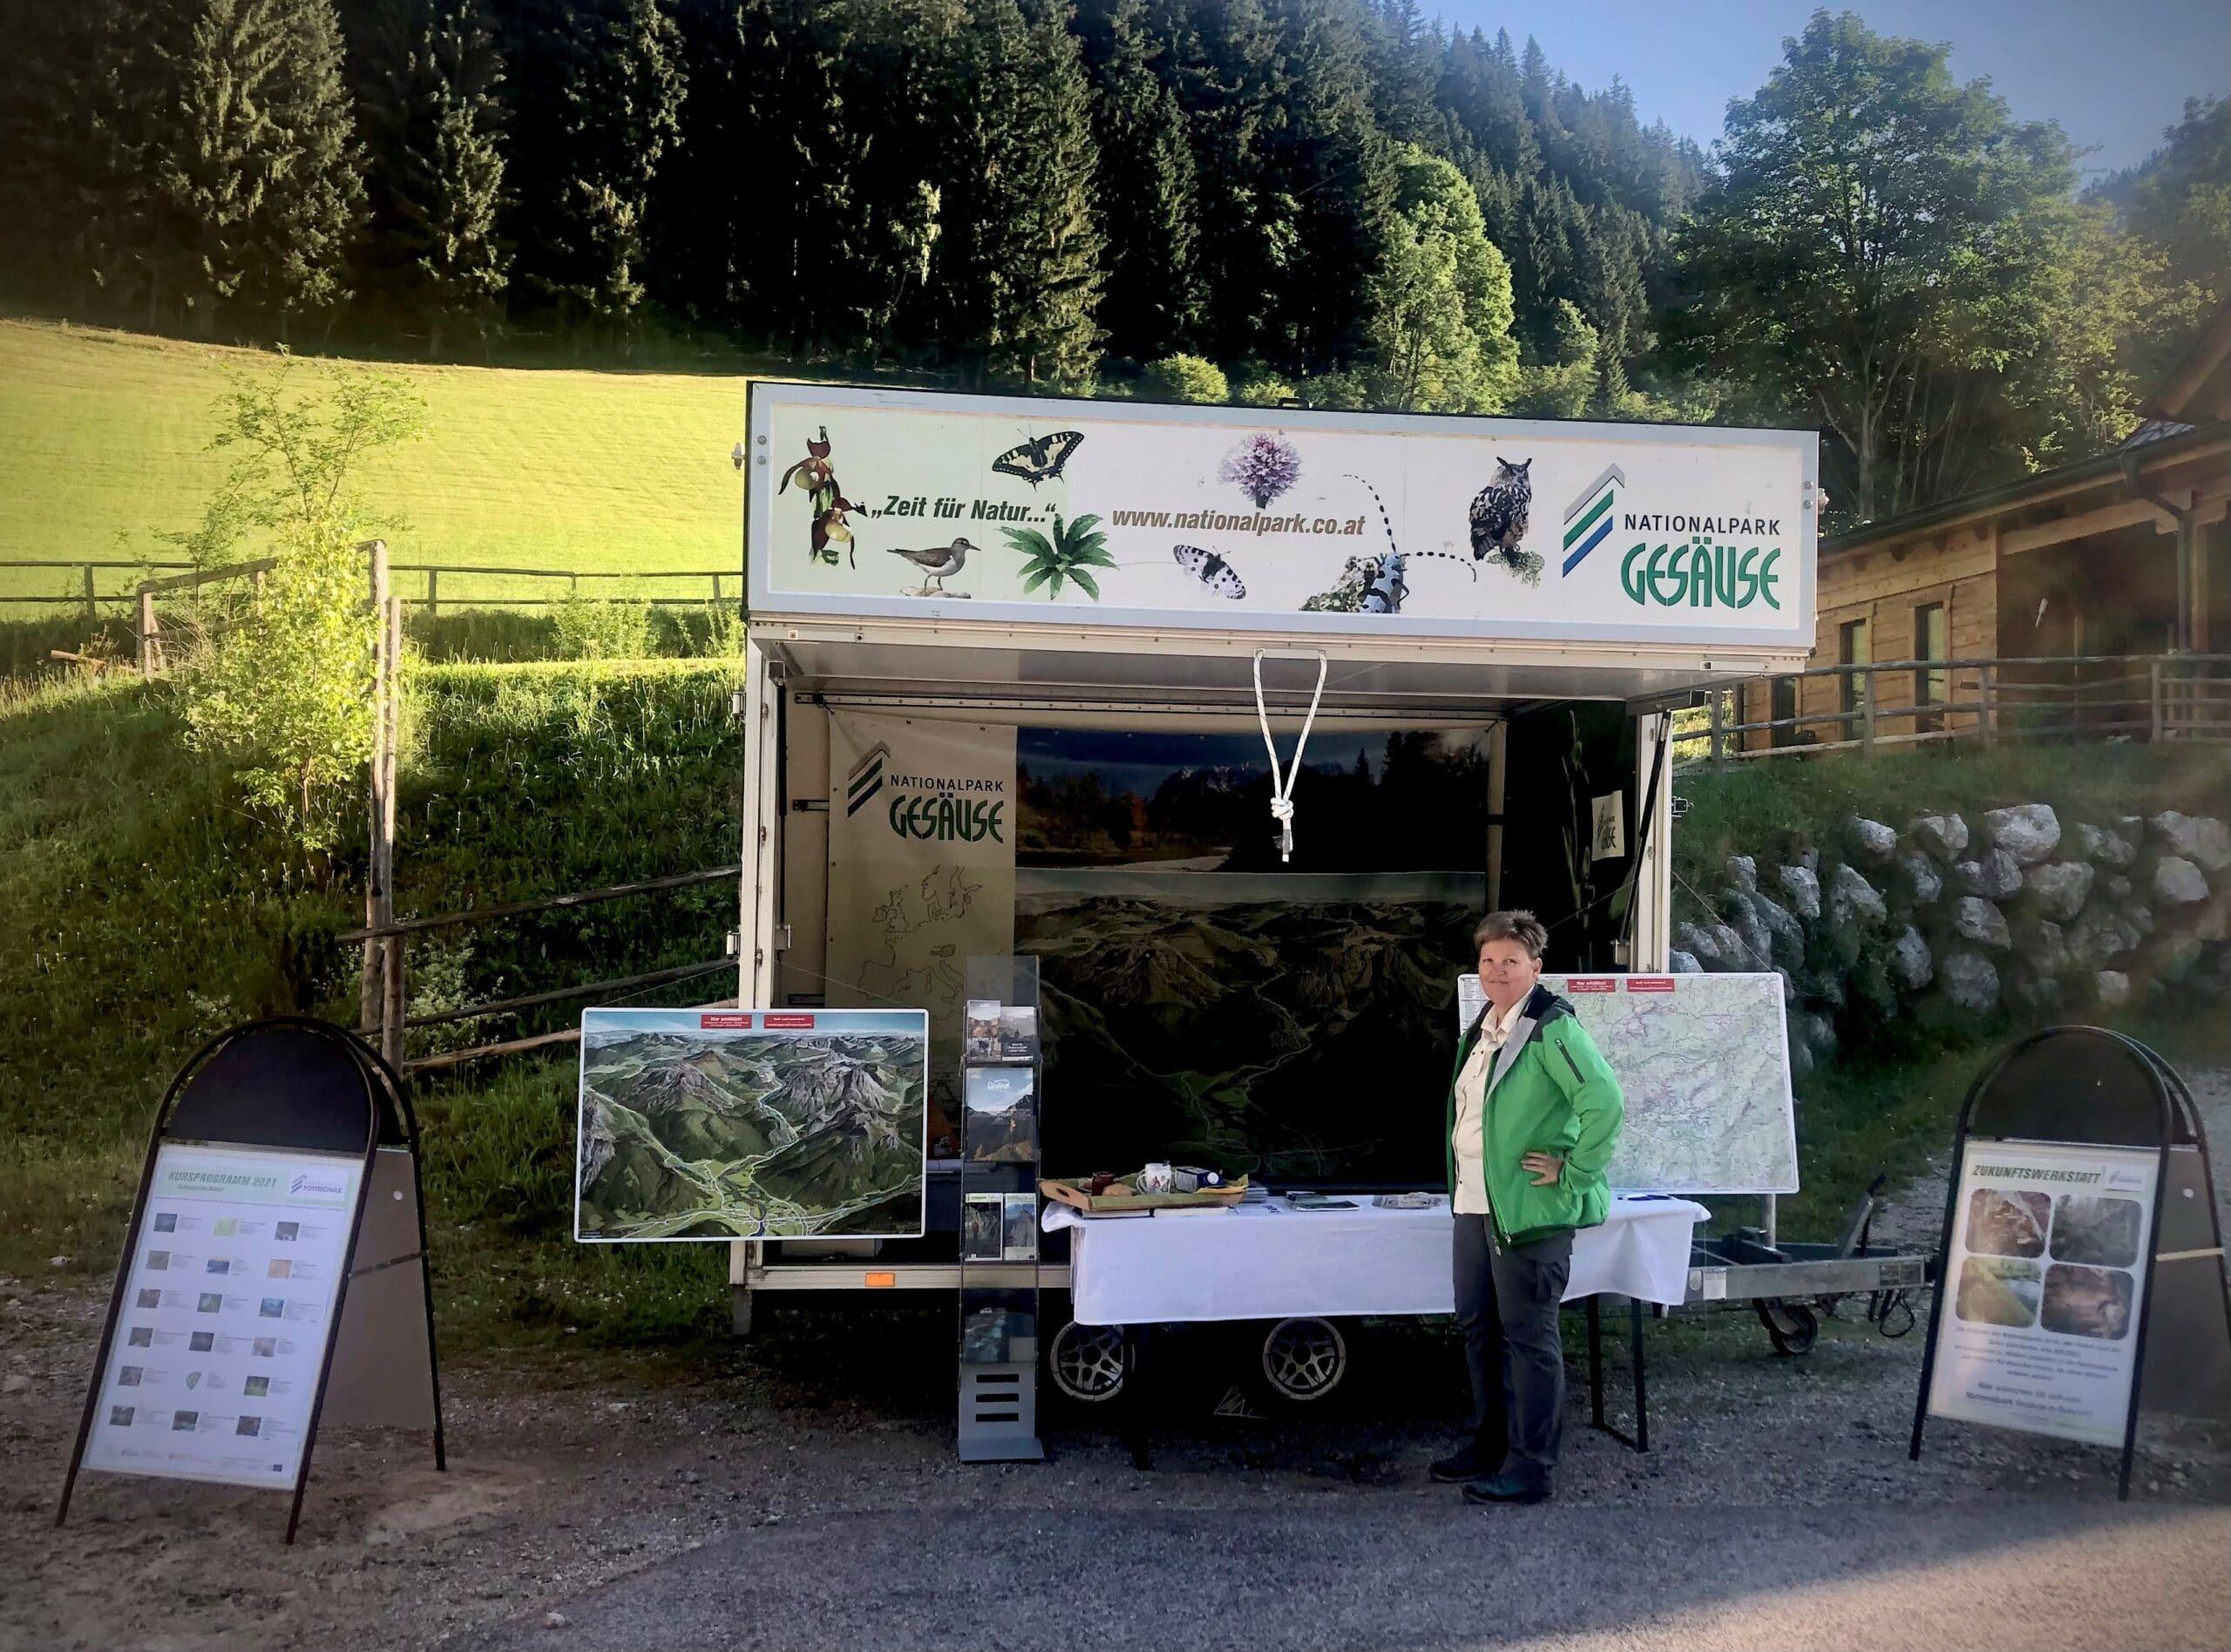 2021_07_16_Infomobil_Johnsbach_c_Nationalpark_Gesaeuse_GmbH_Werner_Huber